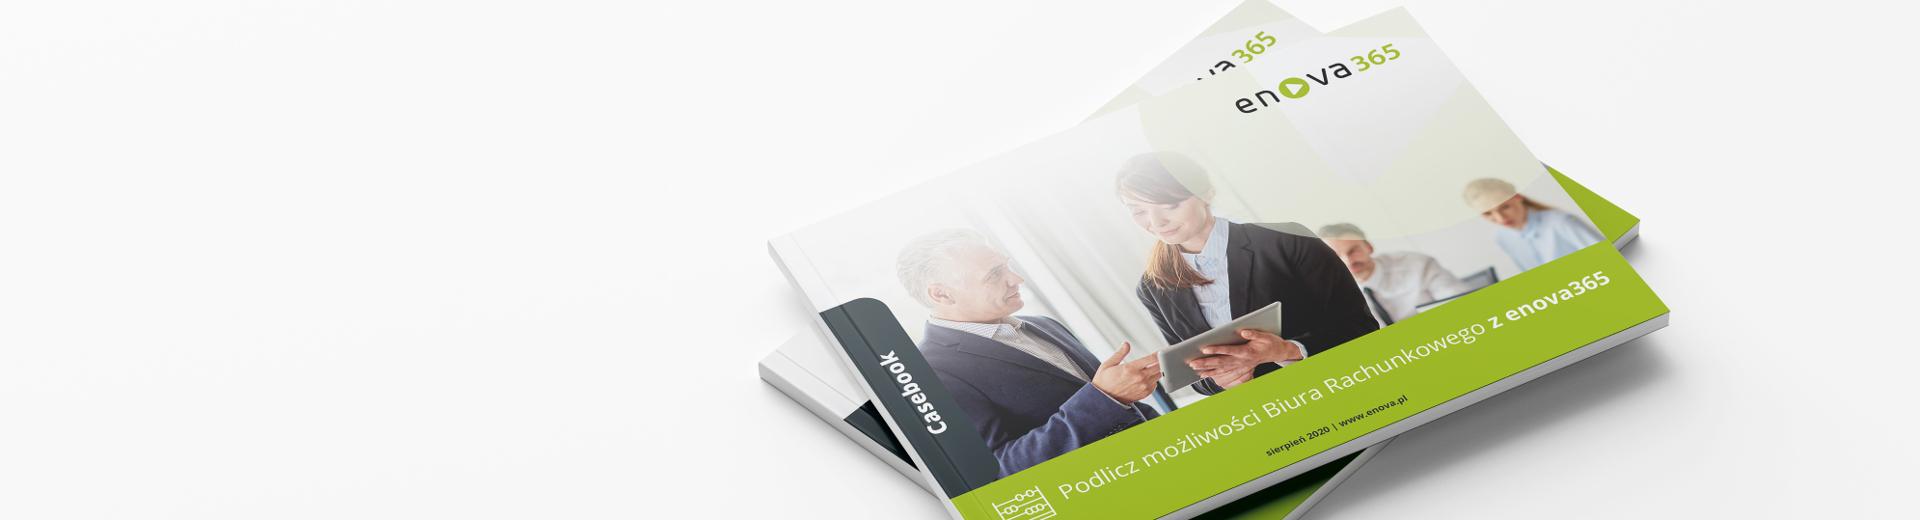 Casebook dla Biur Rachunkowych ERP enova365